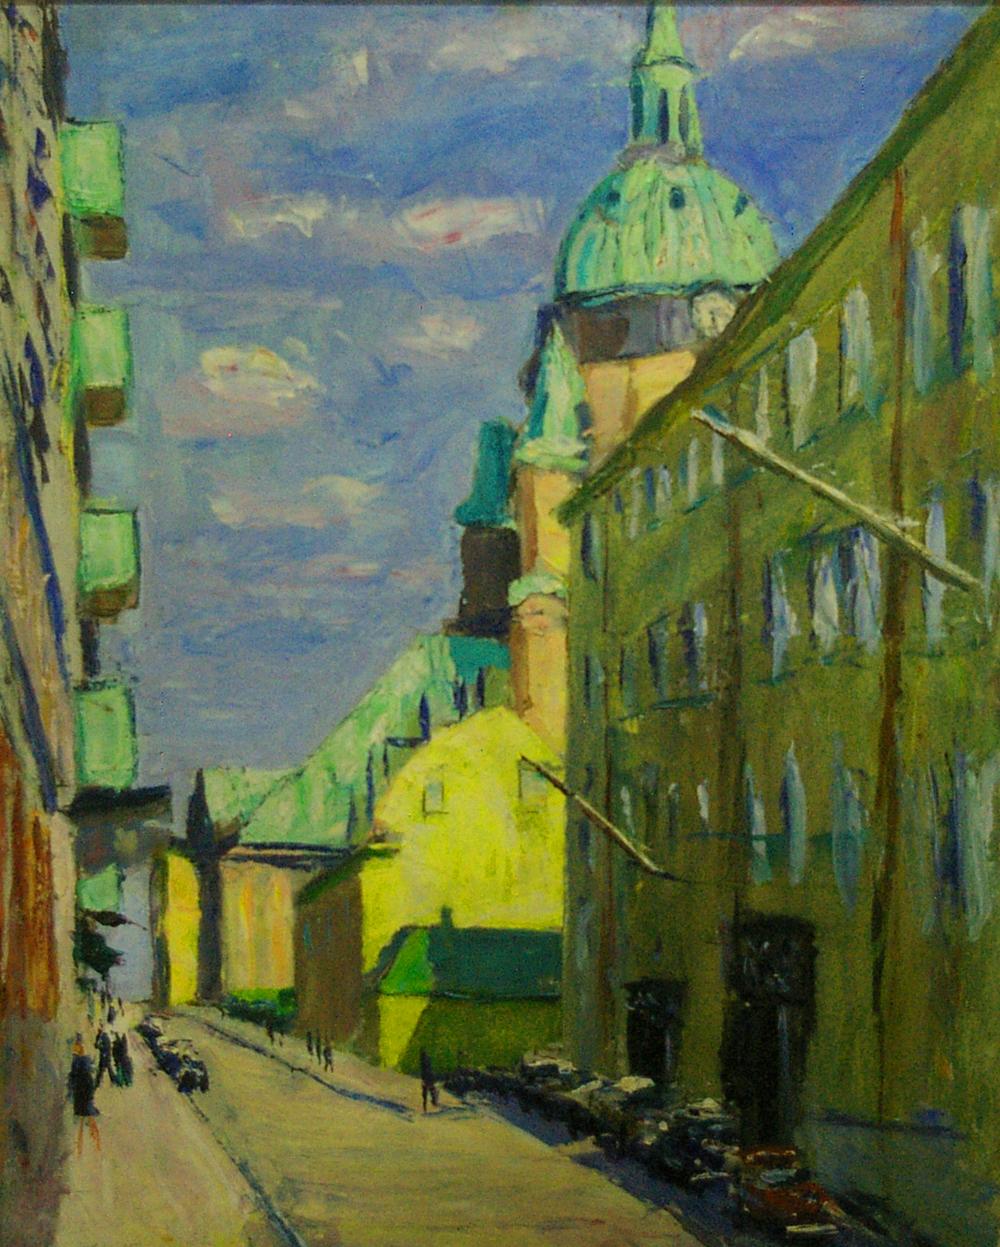 Emerson Burkhart, 'Melman Hotel, Stockholm, Sweden'